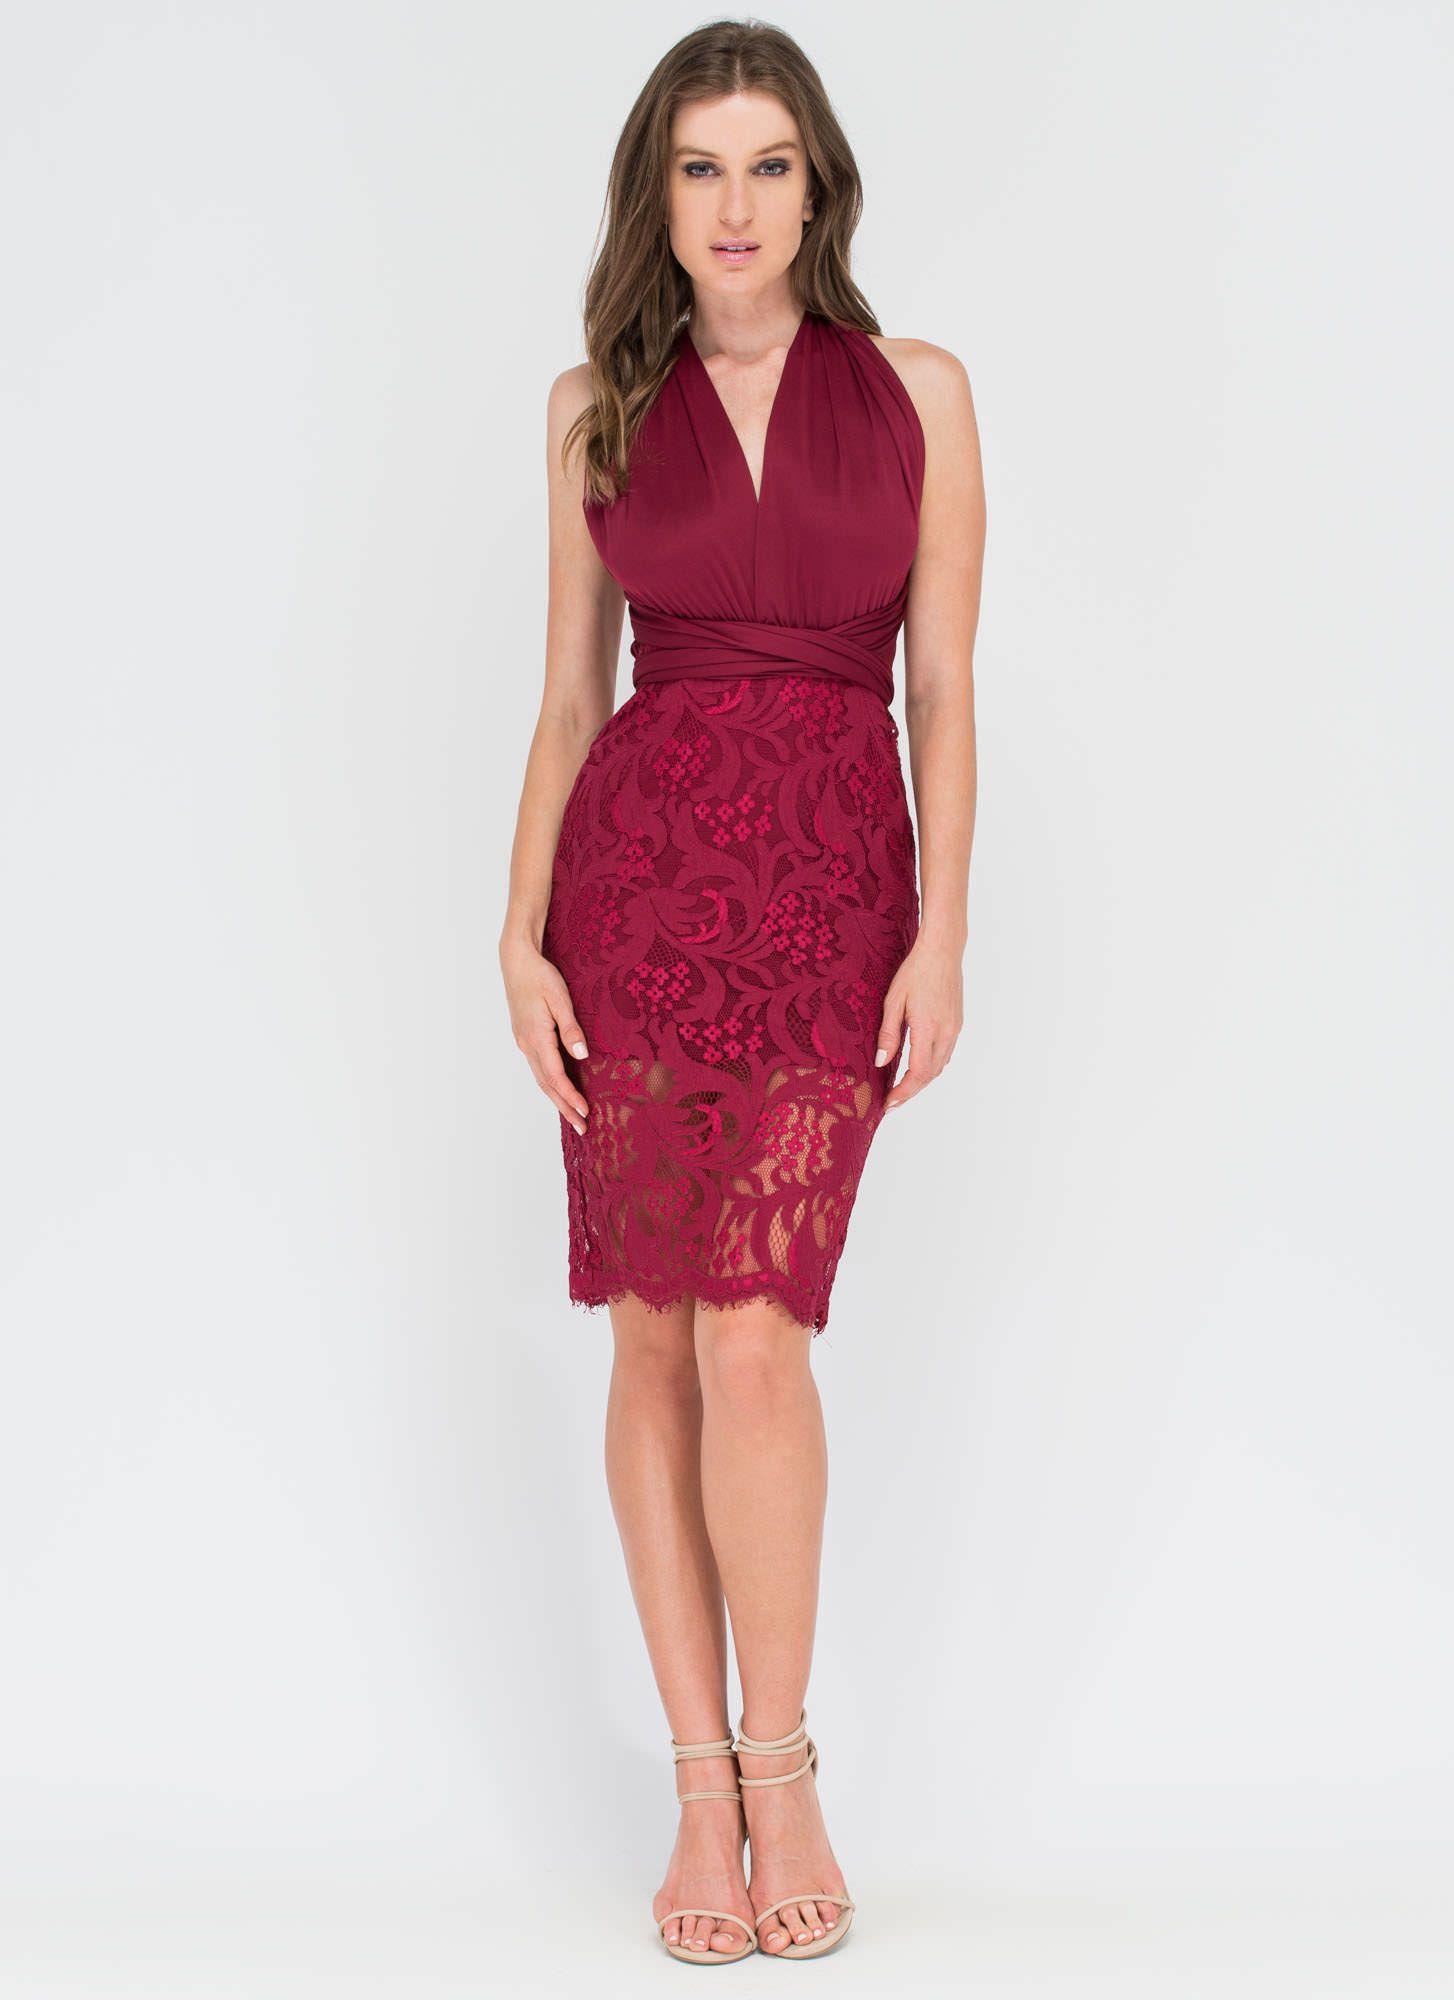 My Way Convertible Lace Bodycon Dress BURGUNDY - GoJane.com ...